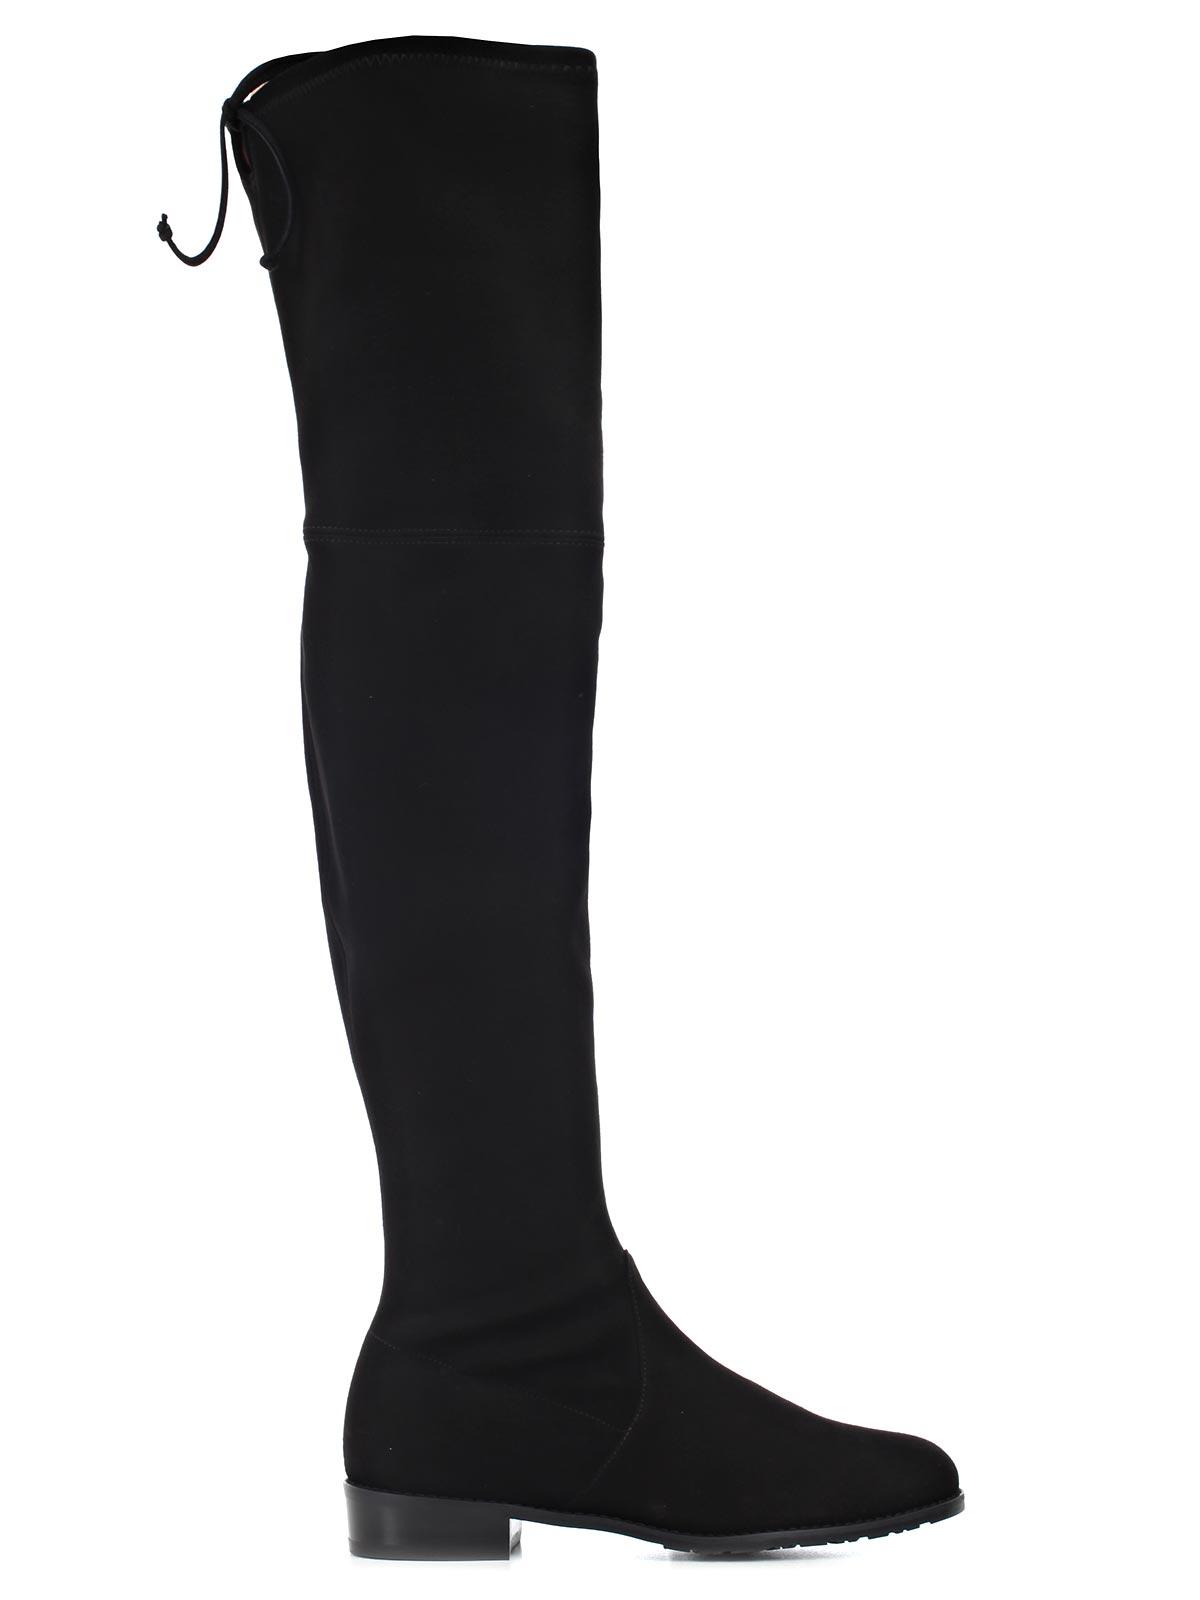 Picture of STUART WEITZMAN Boots